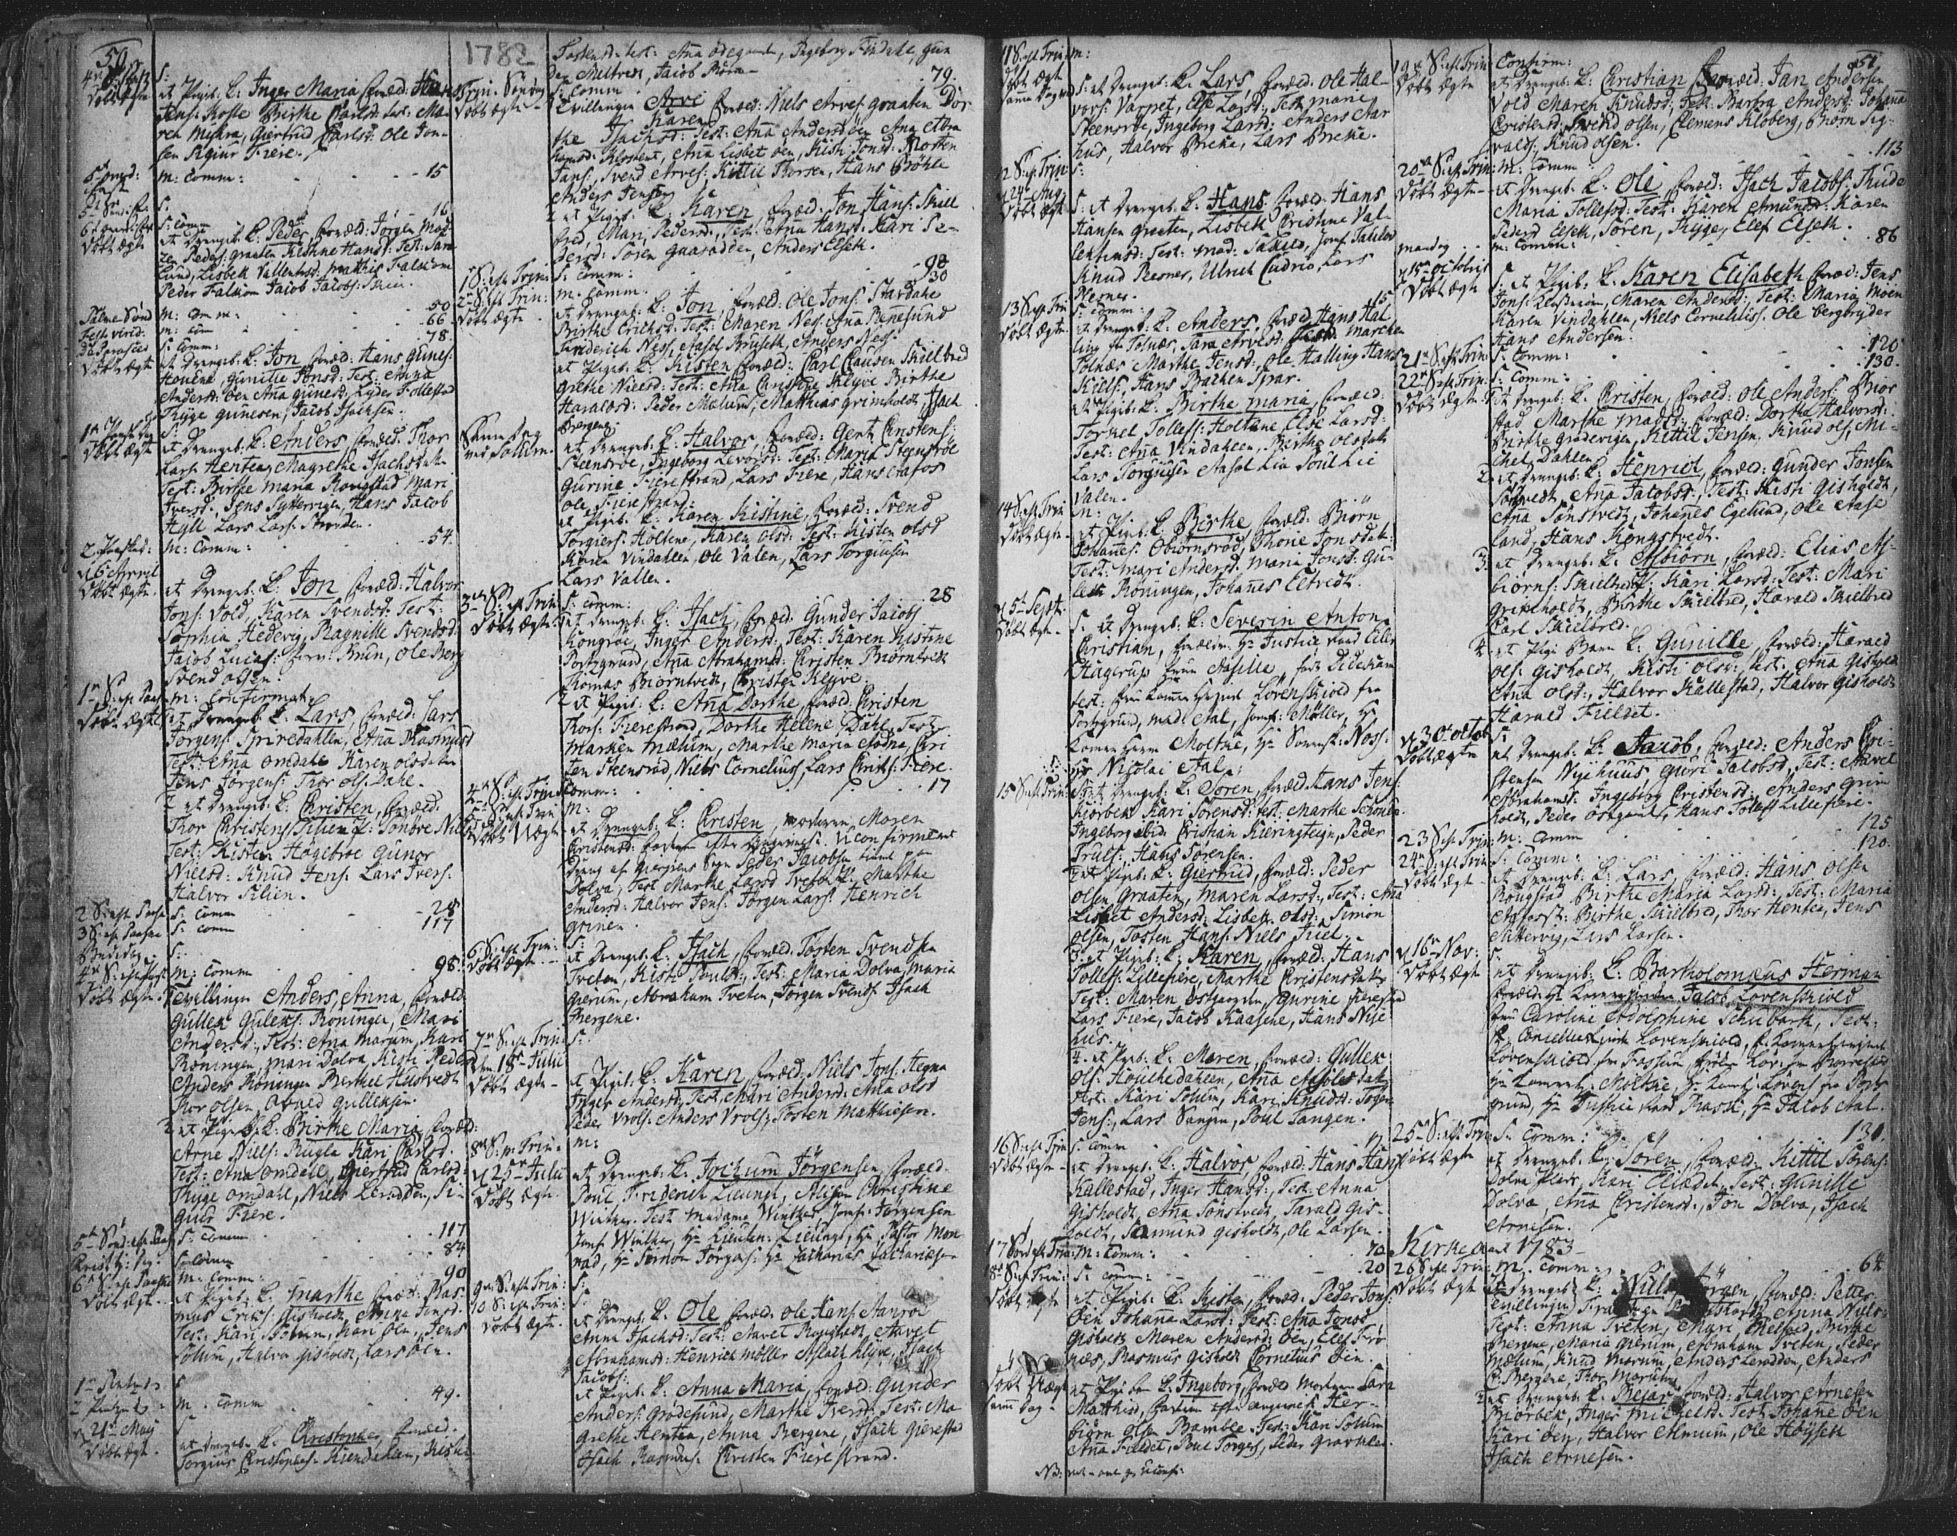 SAKO, Solum kirkebøker, F/Fa/L0003: Ministerialbok nr. I 3, 1761-1814, s. 50-51